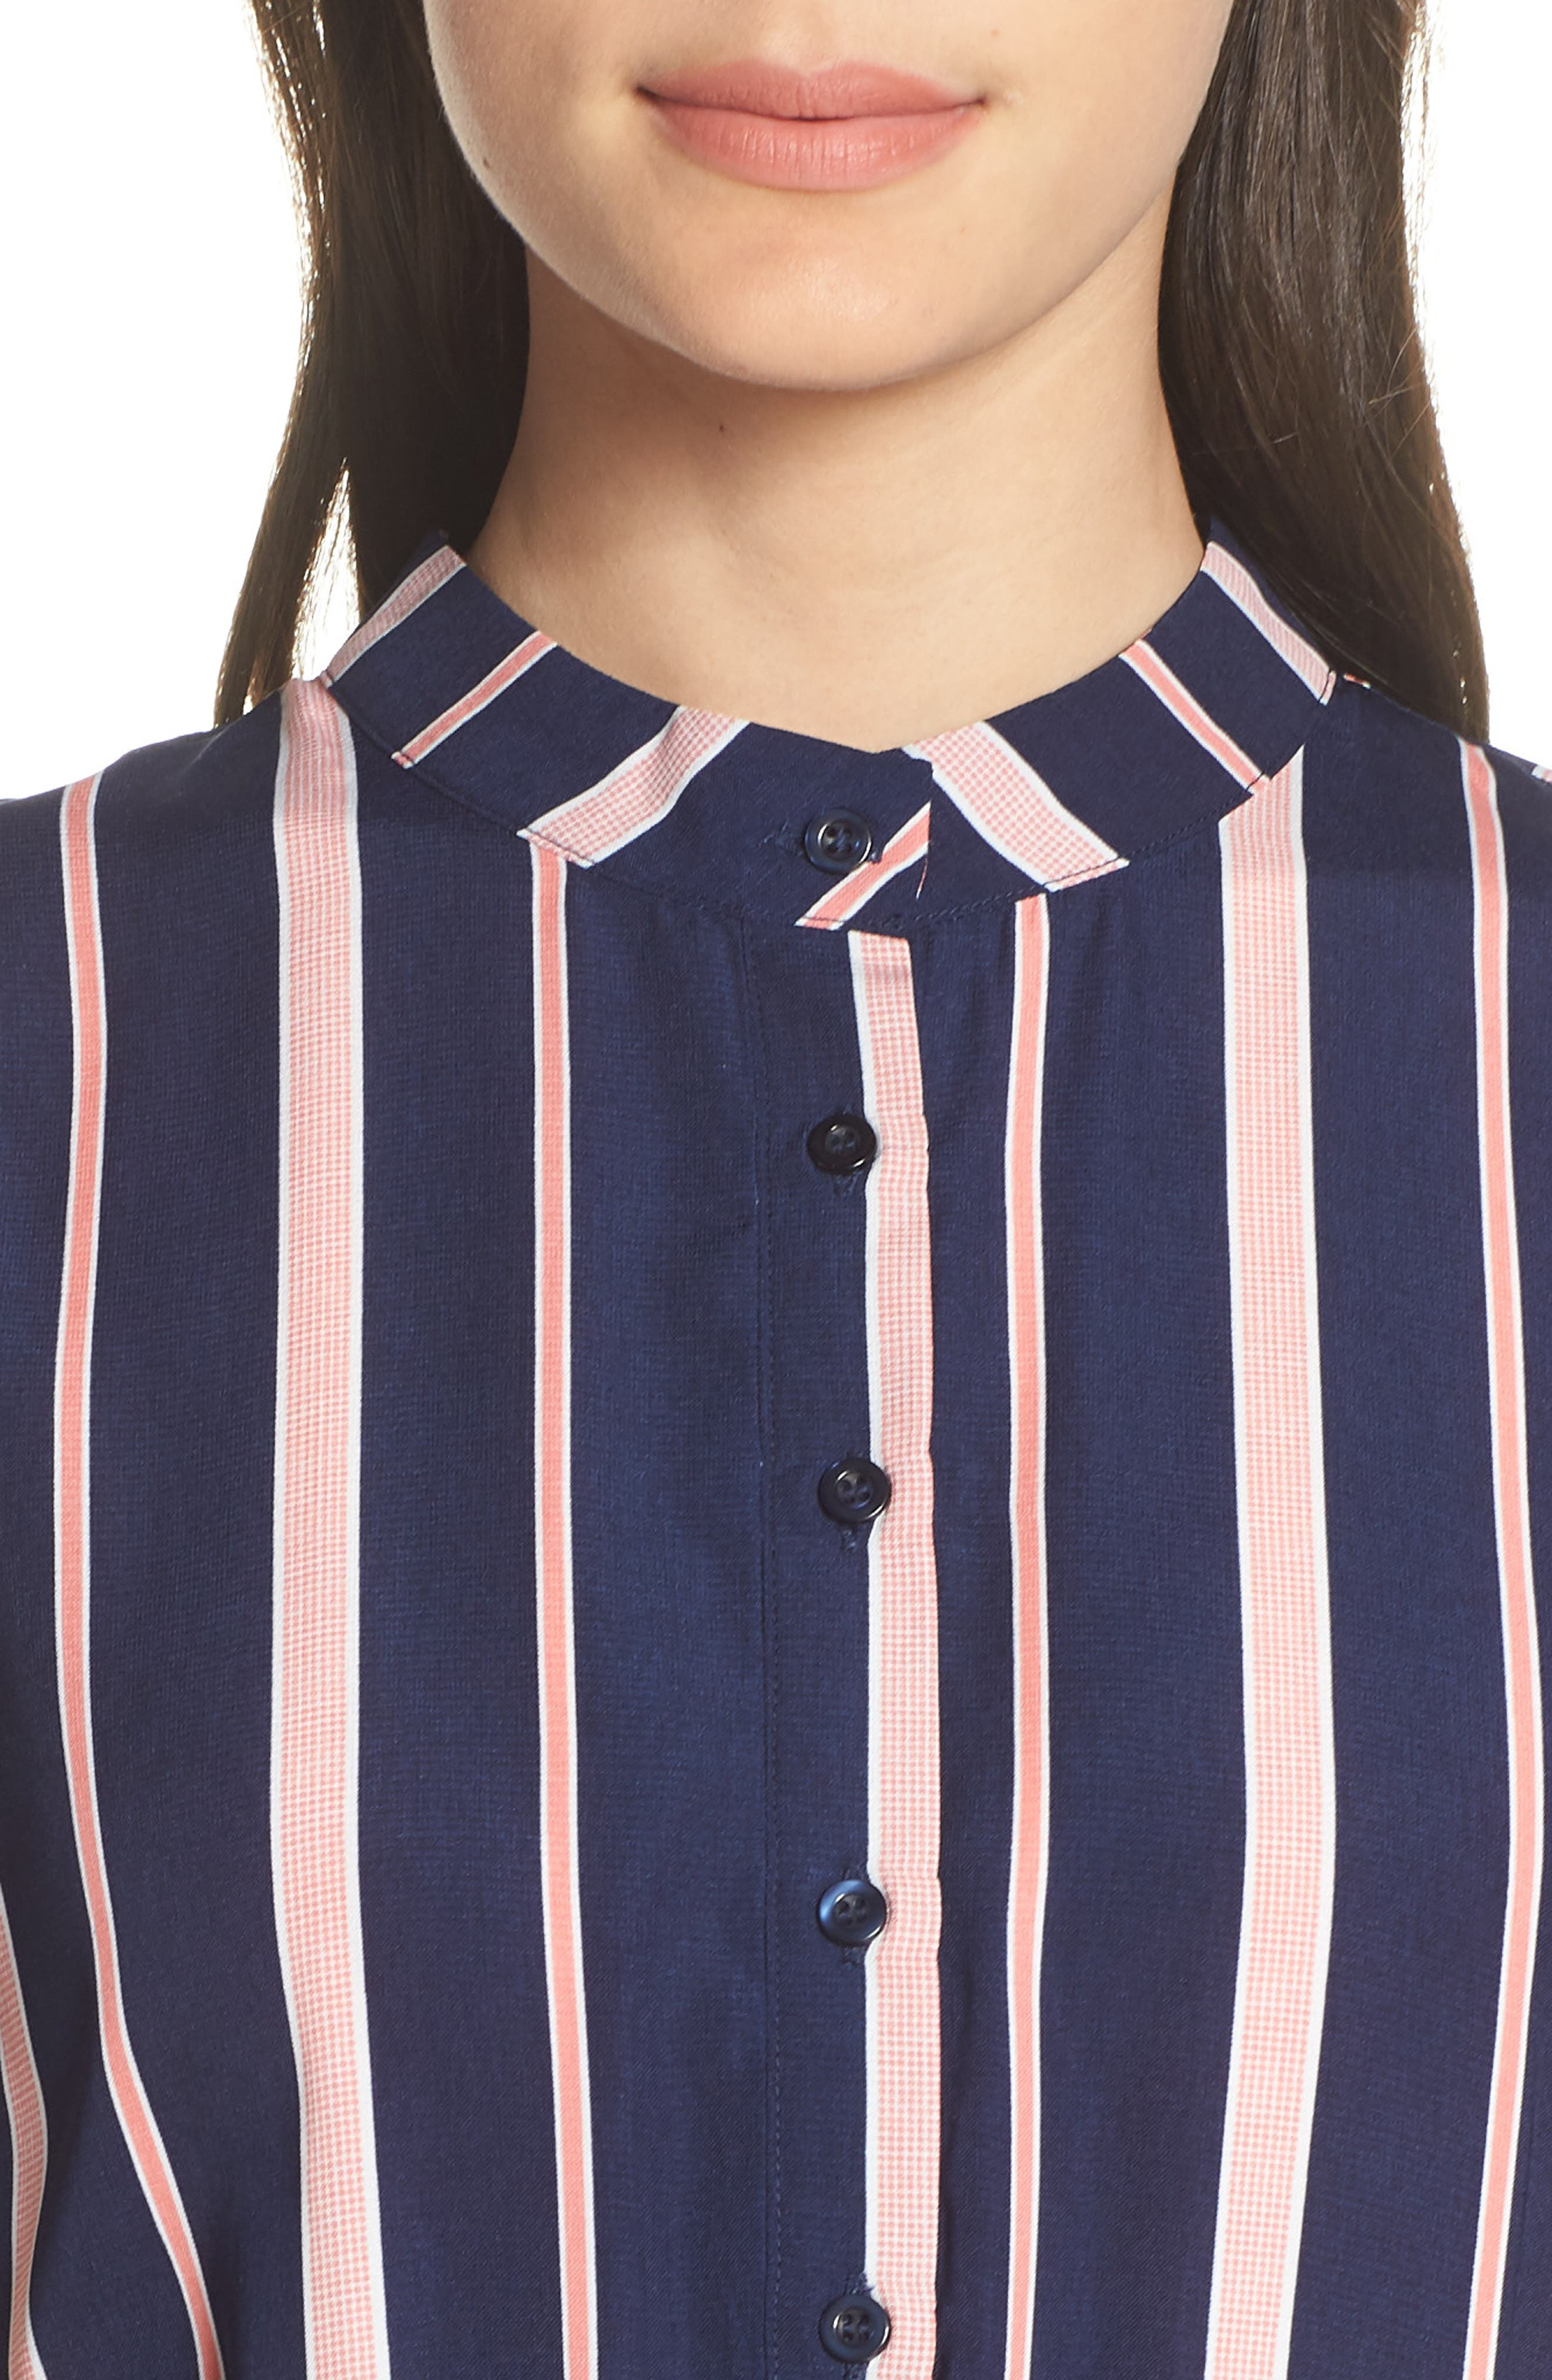 CHARLES HENRY, Smocked Stripe Dress, Alternate thumbnail 5, color, NAVY/ PINK STRIPE